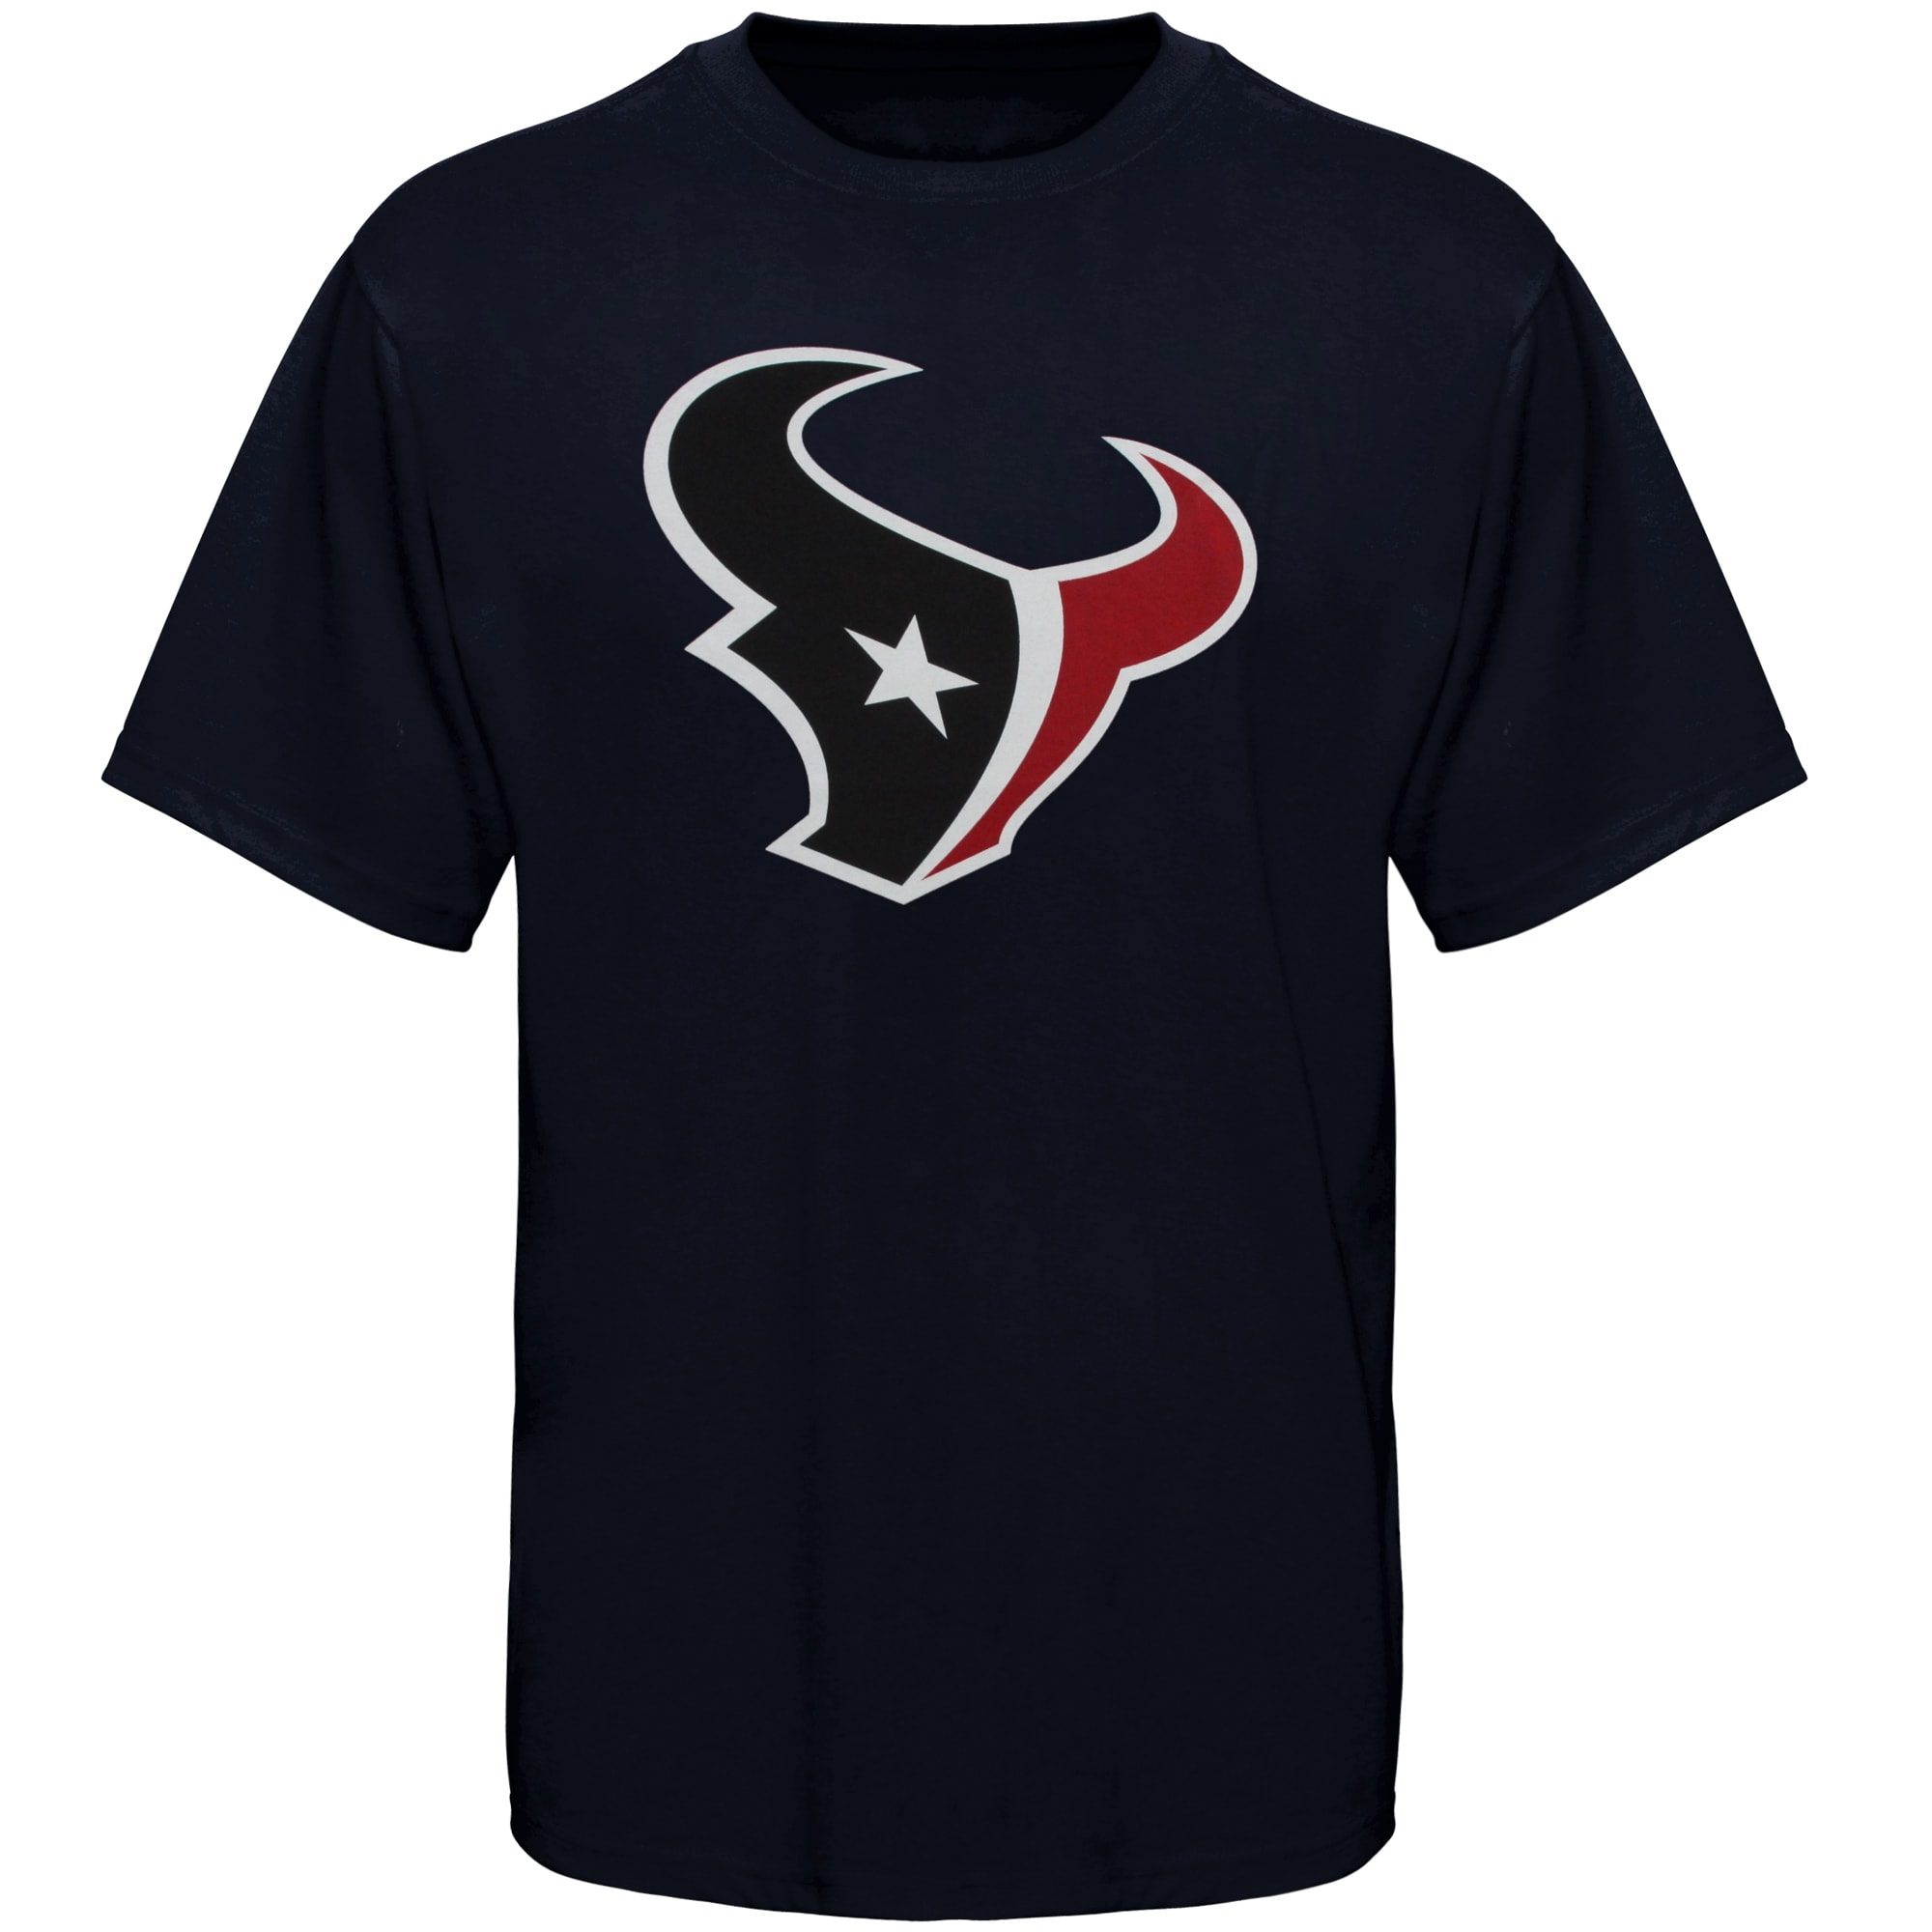 Houston Texans Youth Team Logo T-Shirt - Navy Blue